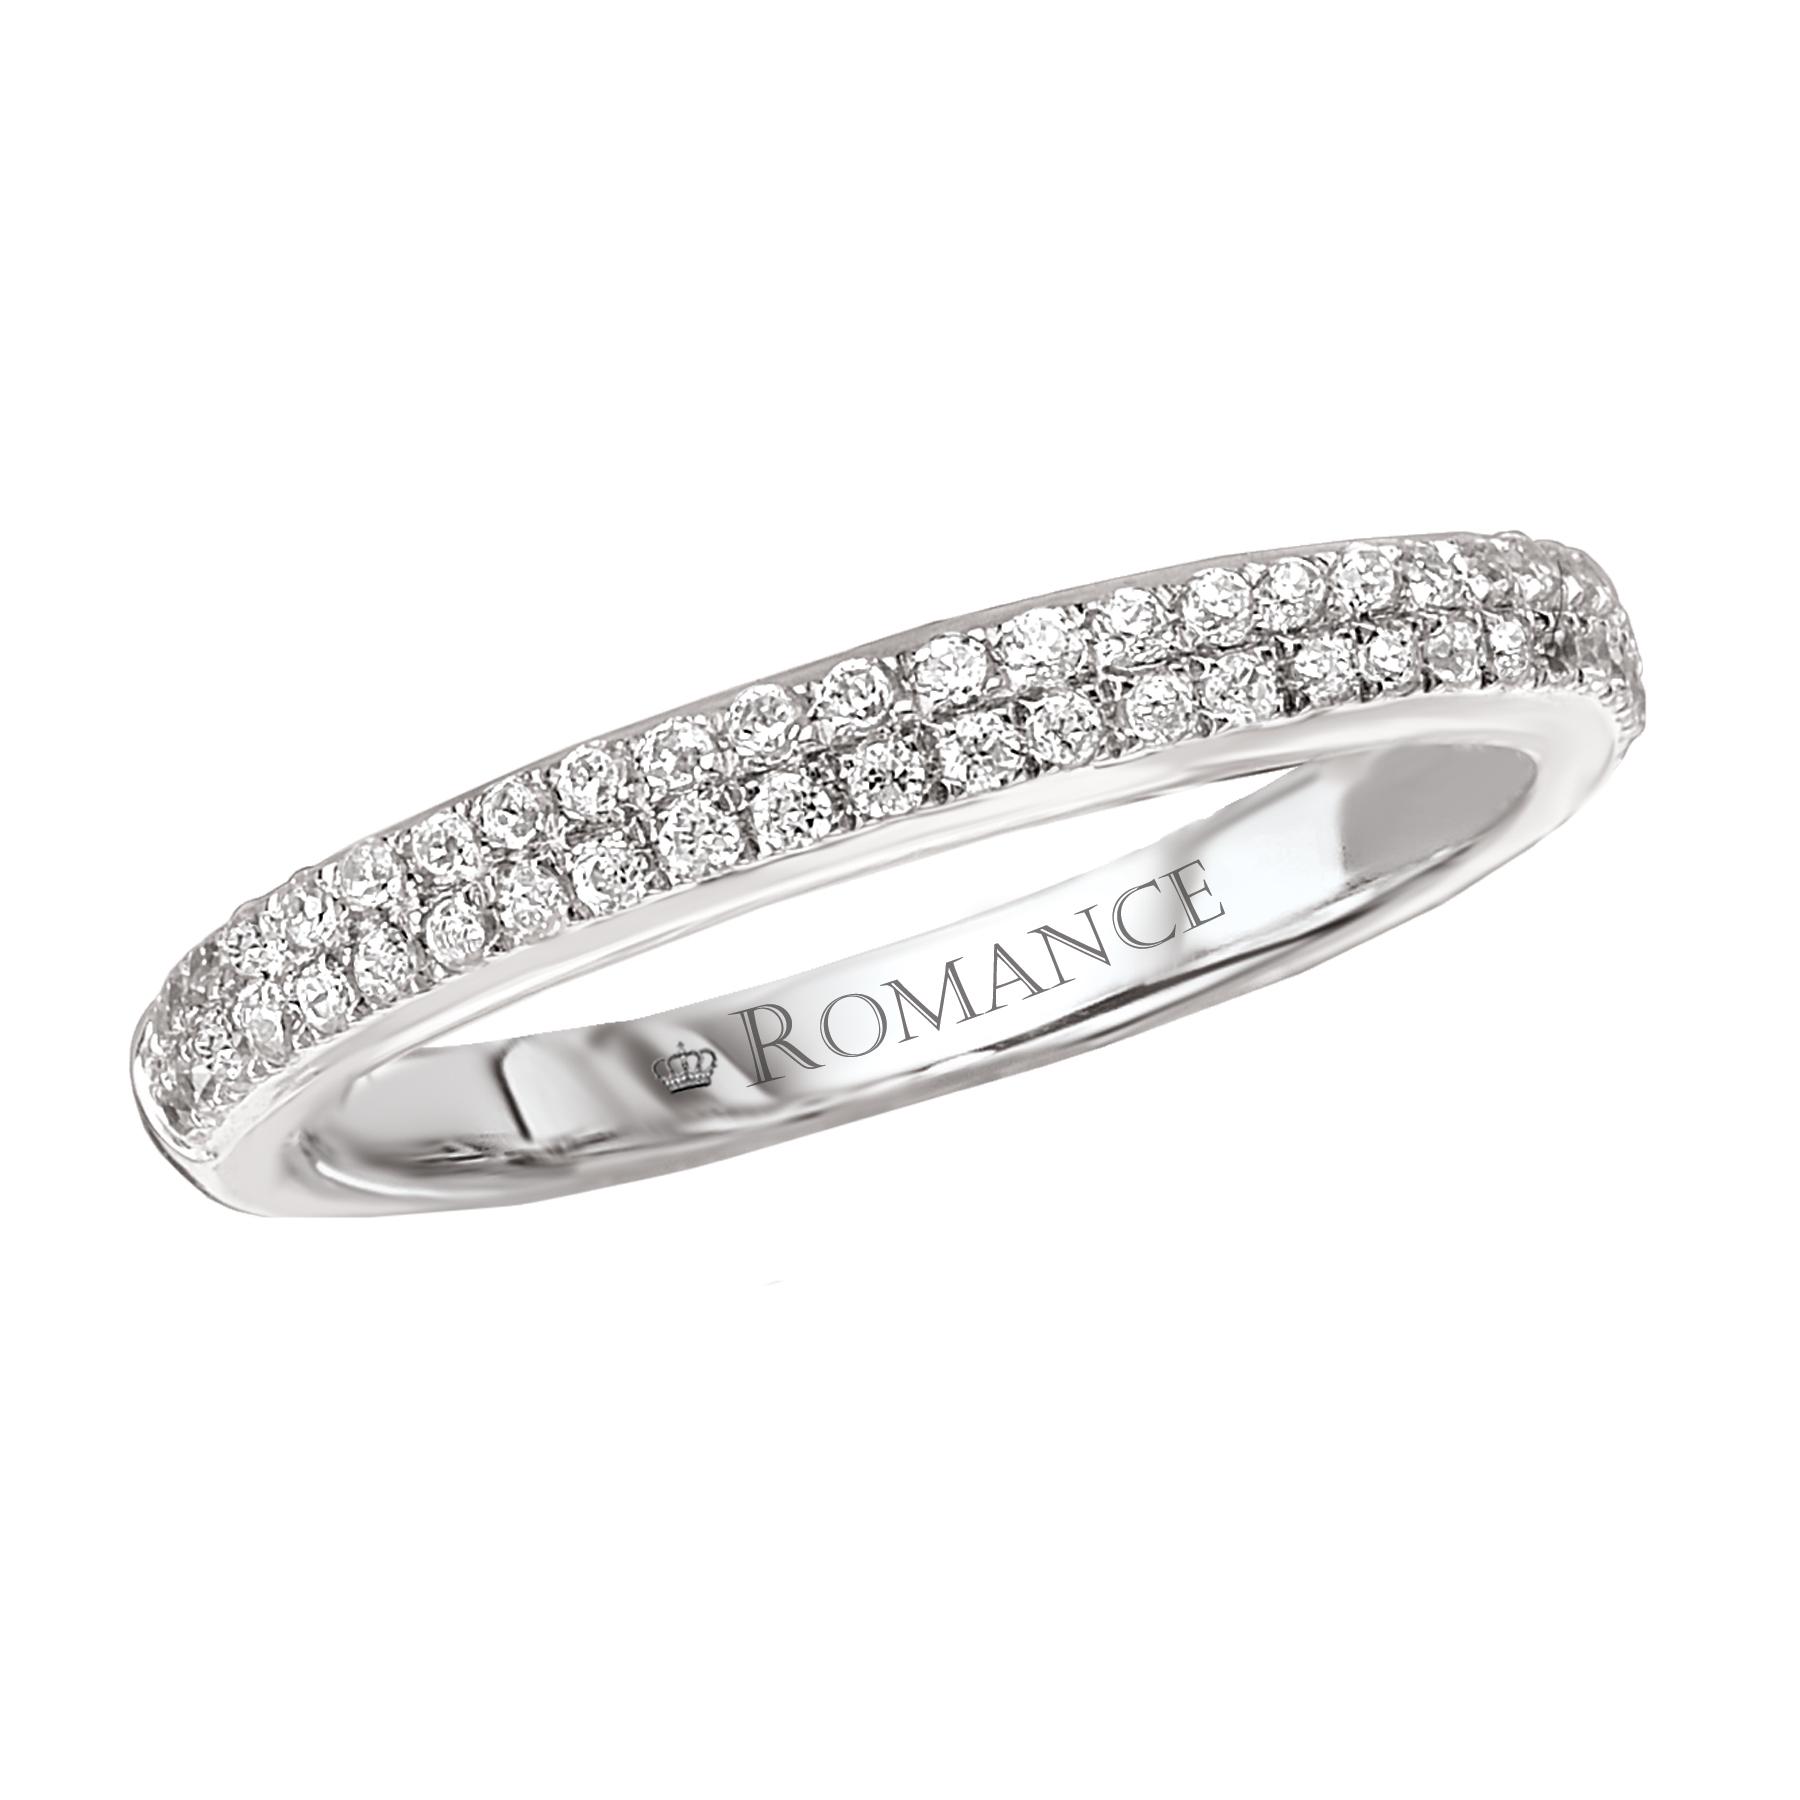 Romance Wedding Bands 117264-W product image